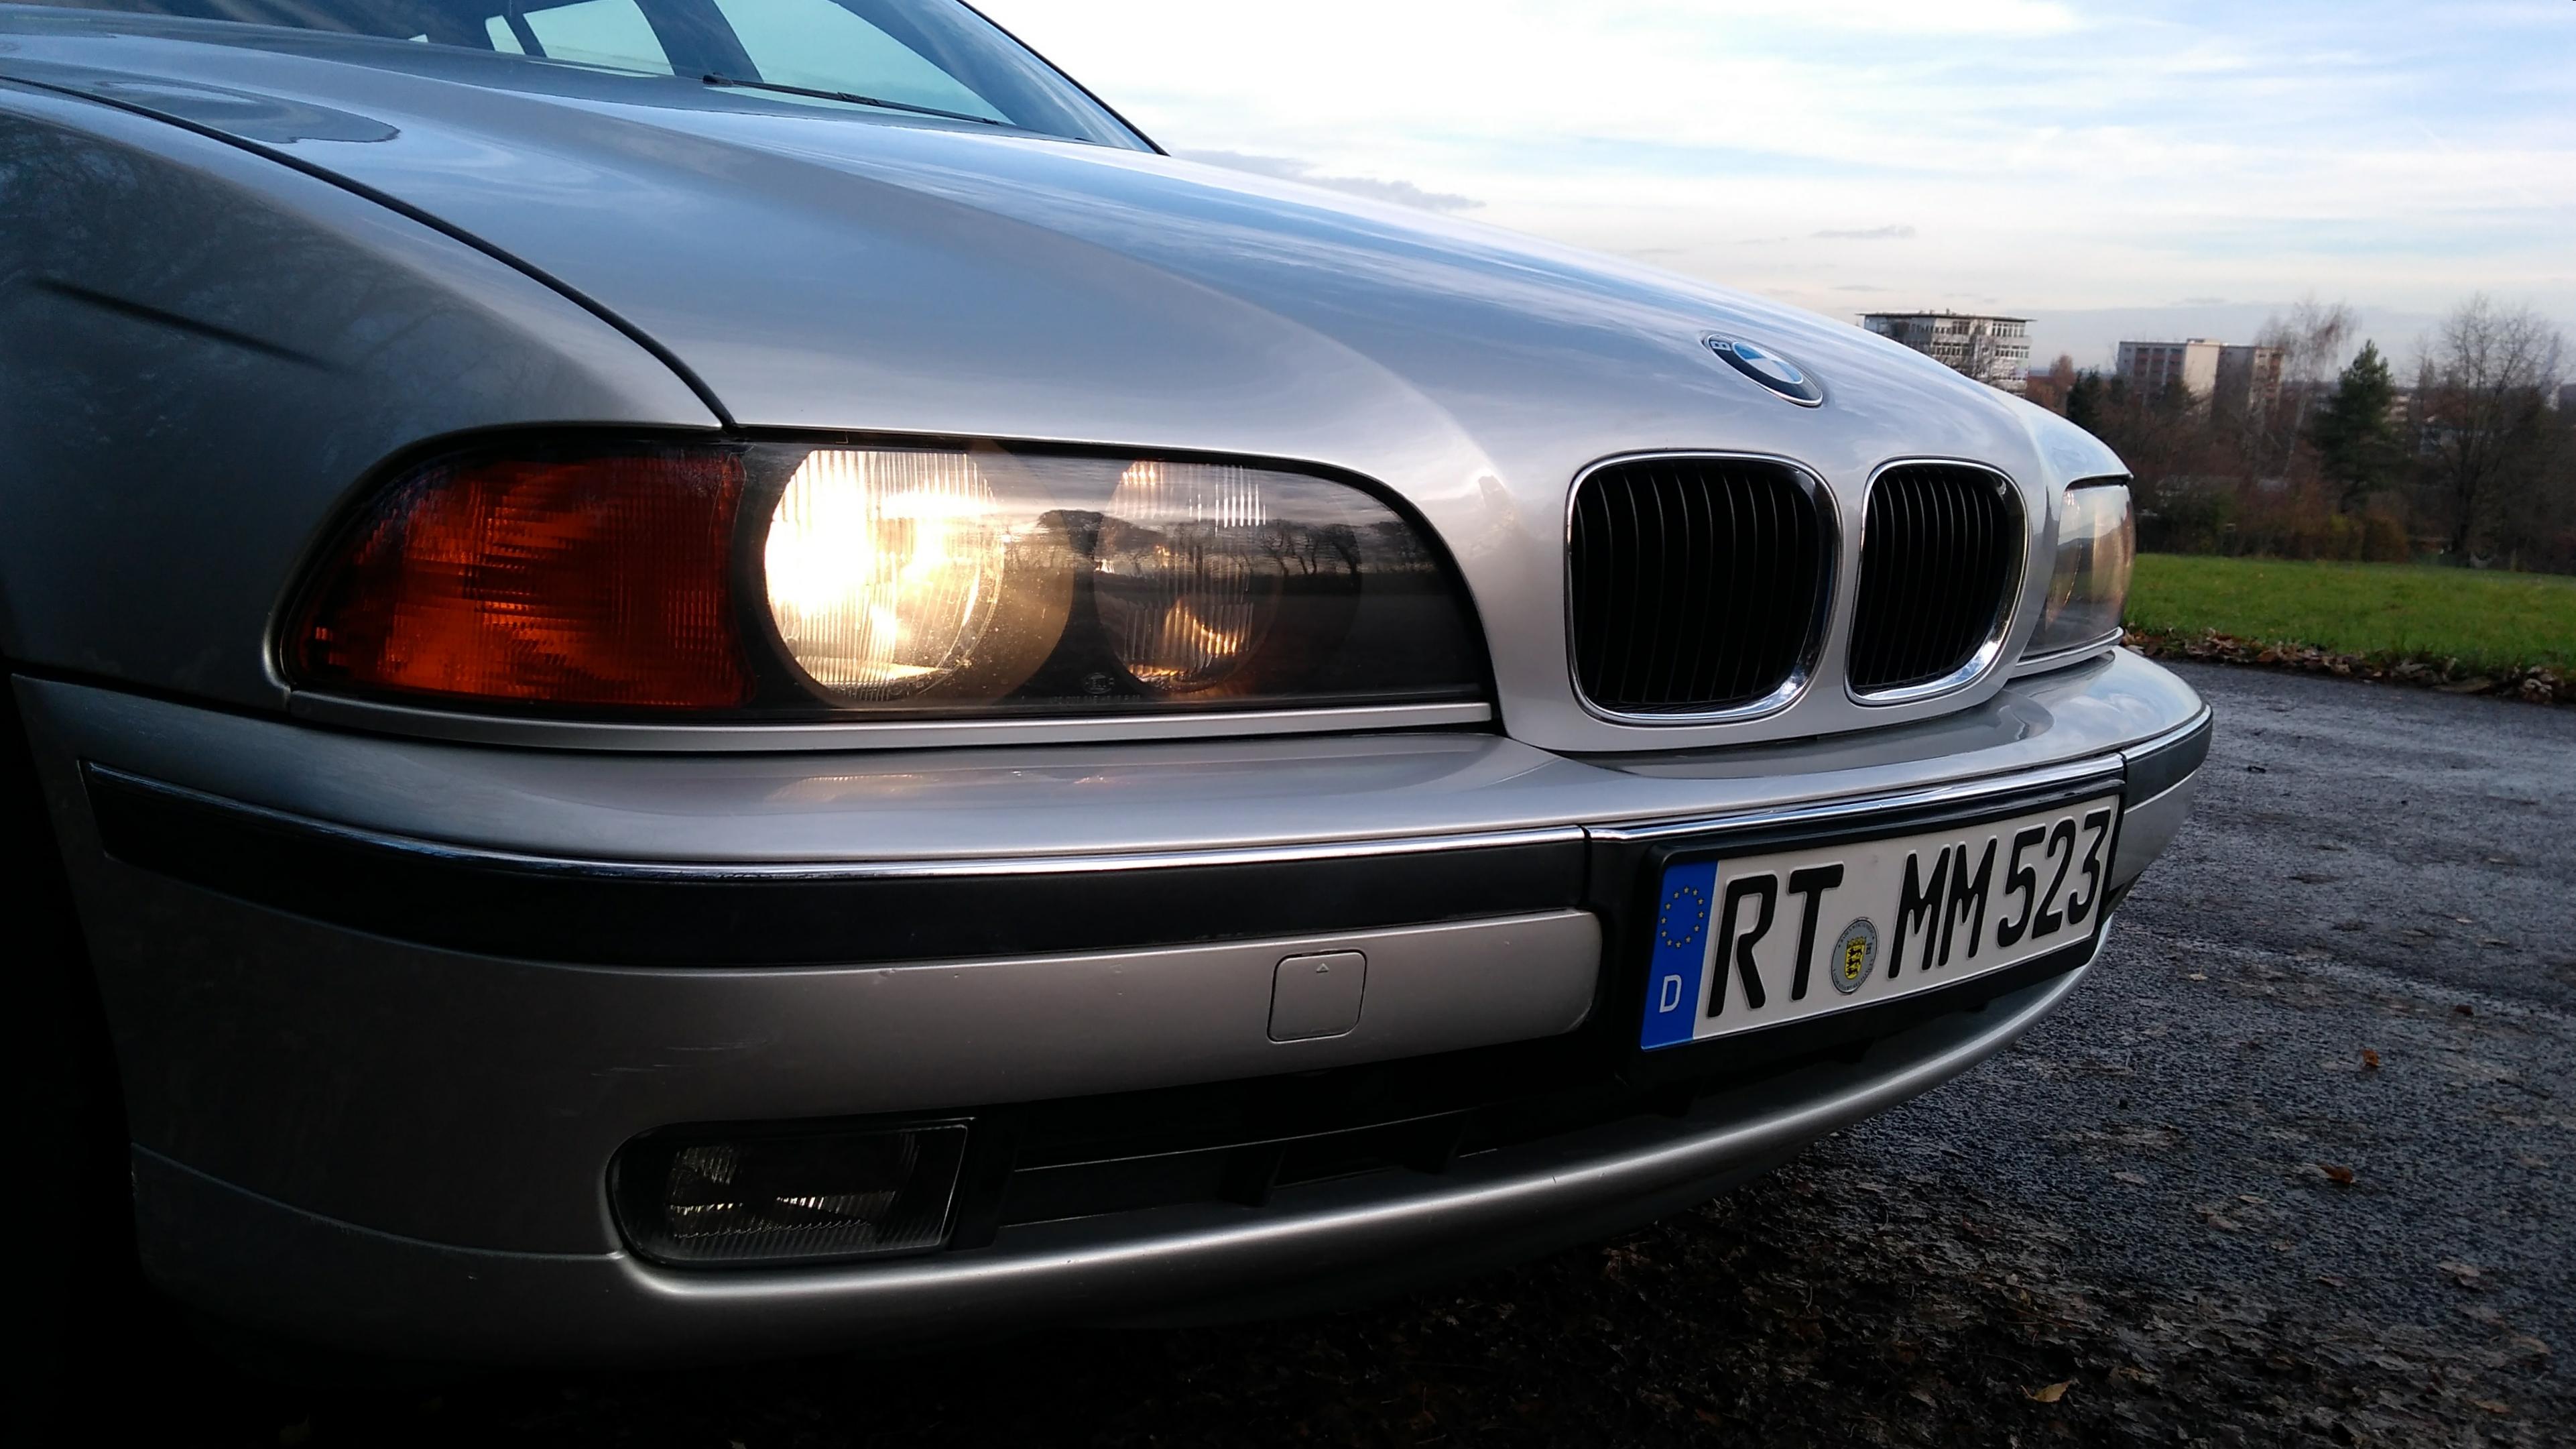 BMW E39 Touring 523i Front